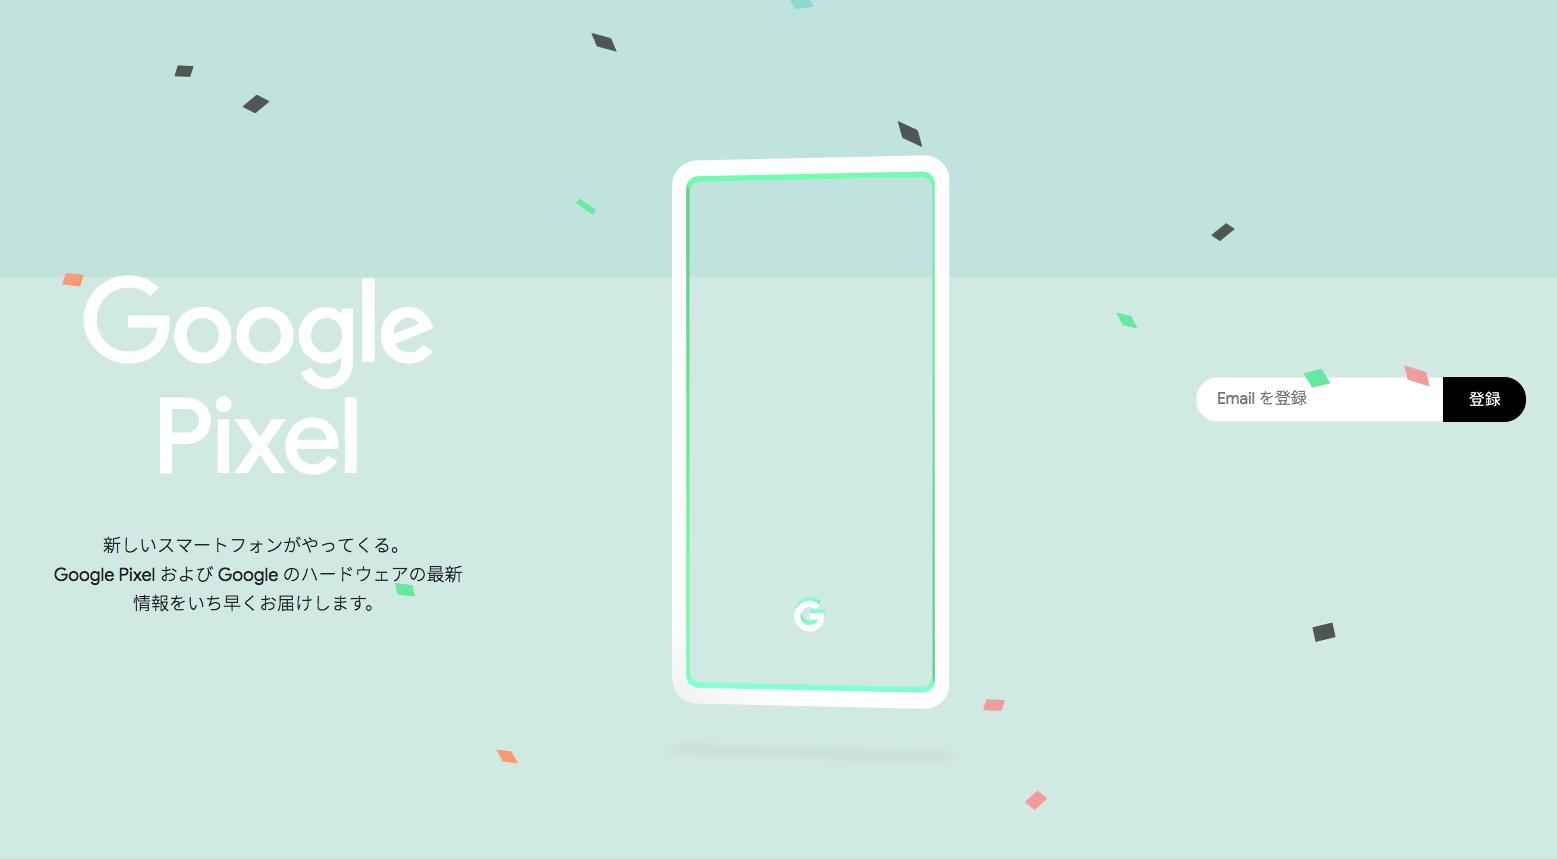 Google Pixelの日本発売が確定。新ティザーサイトも公開